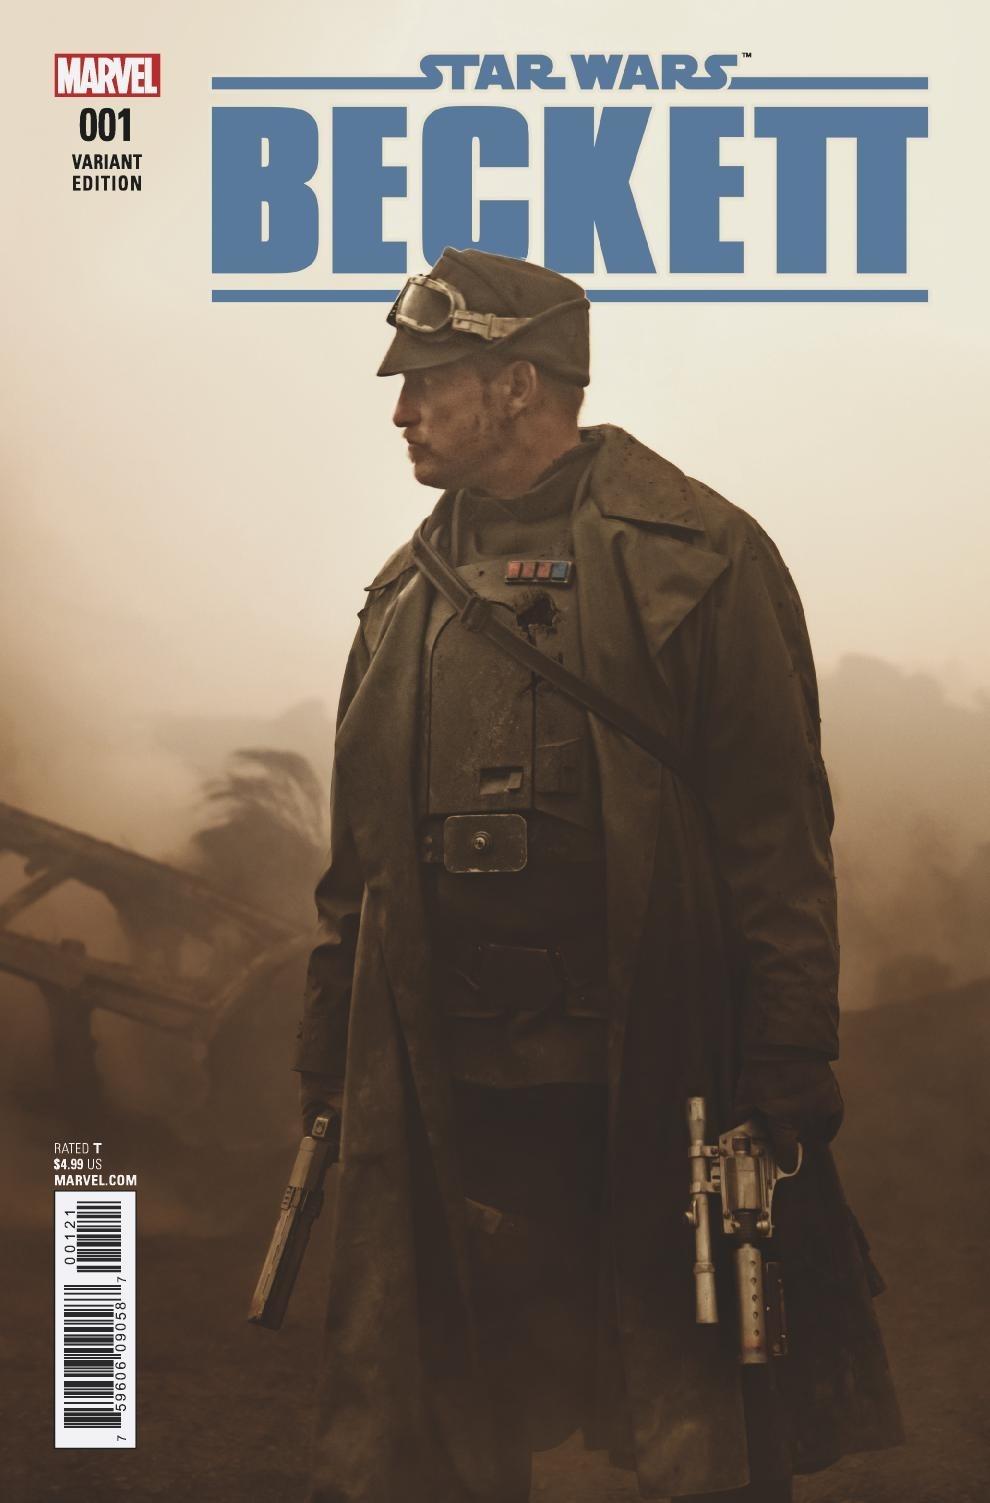 Beckett #1 (Movie Variant Cover) (15.08.2018)